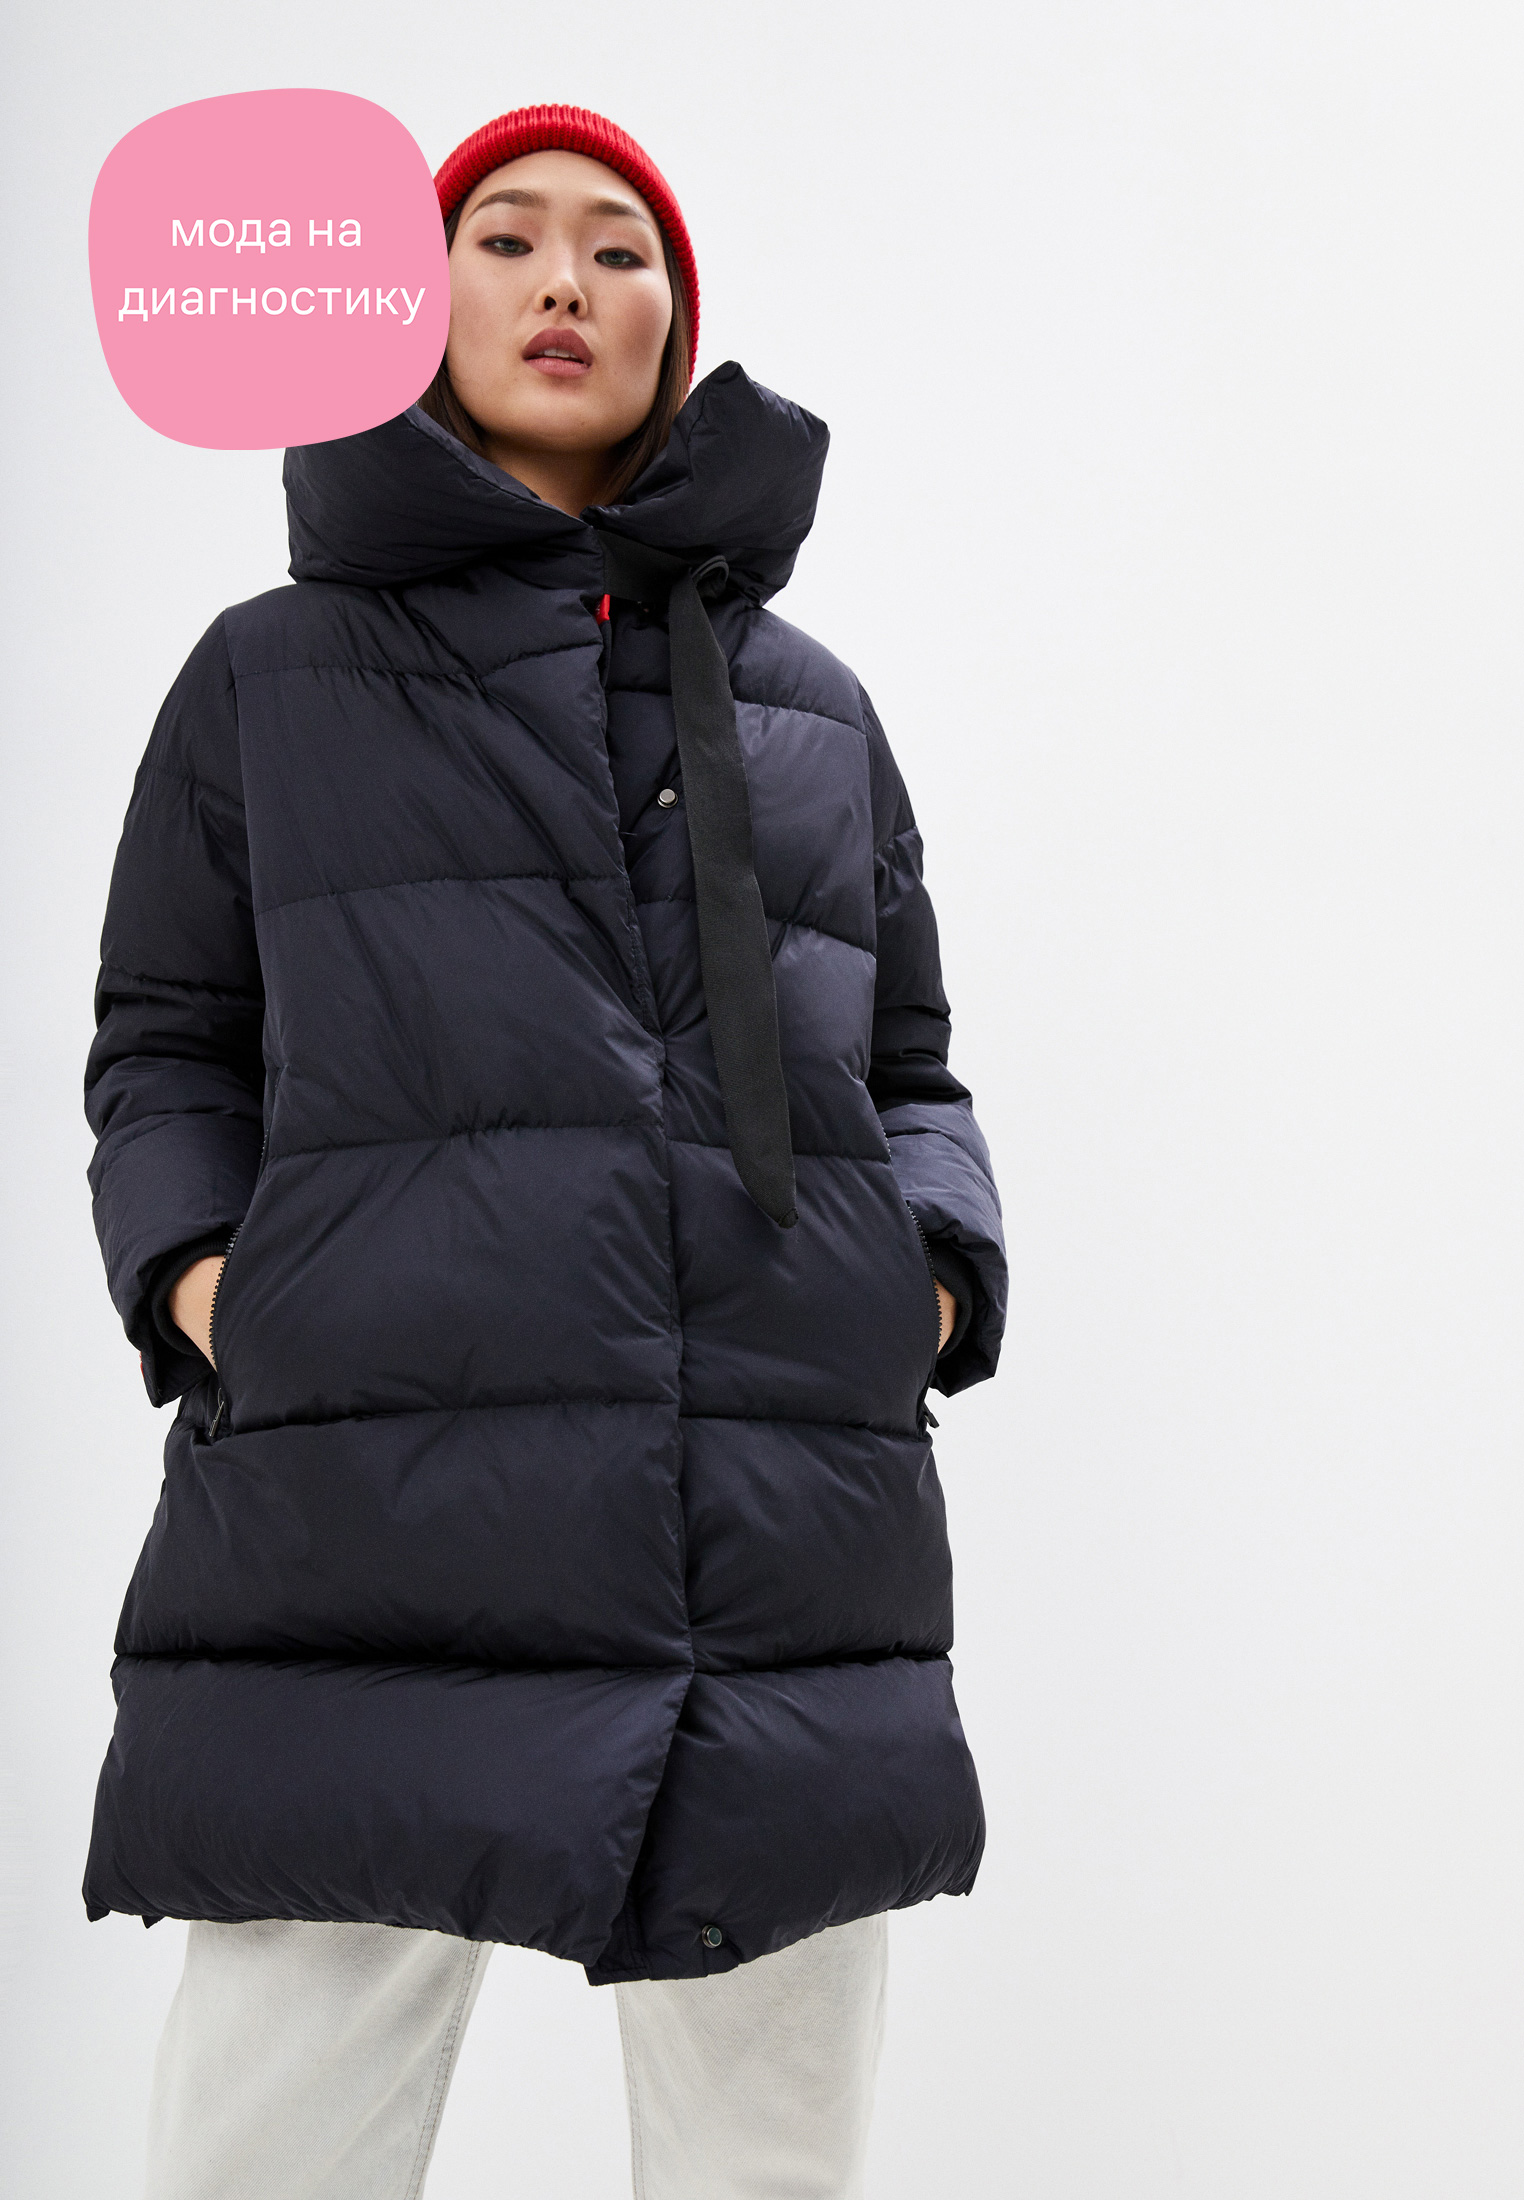 Утепленная куртка Freedomday IFRW543Z121-RD